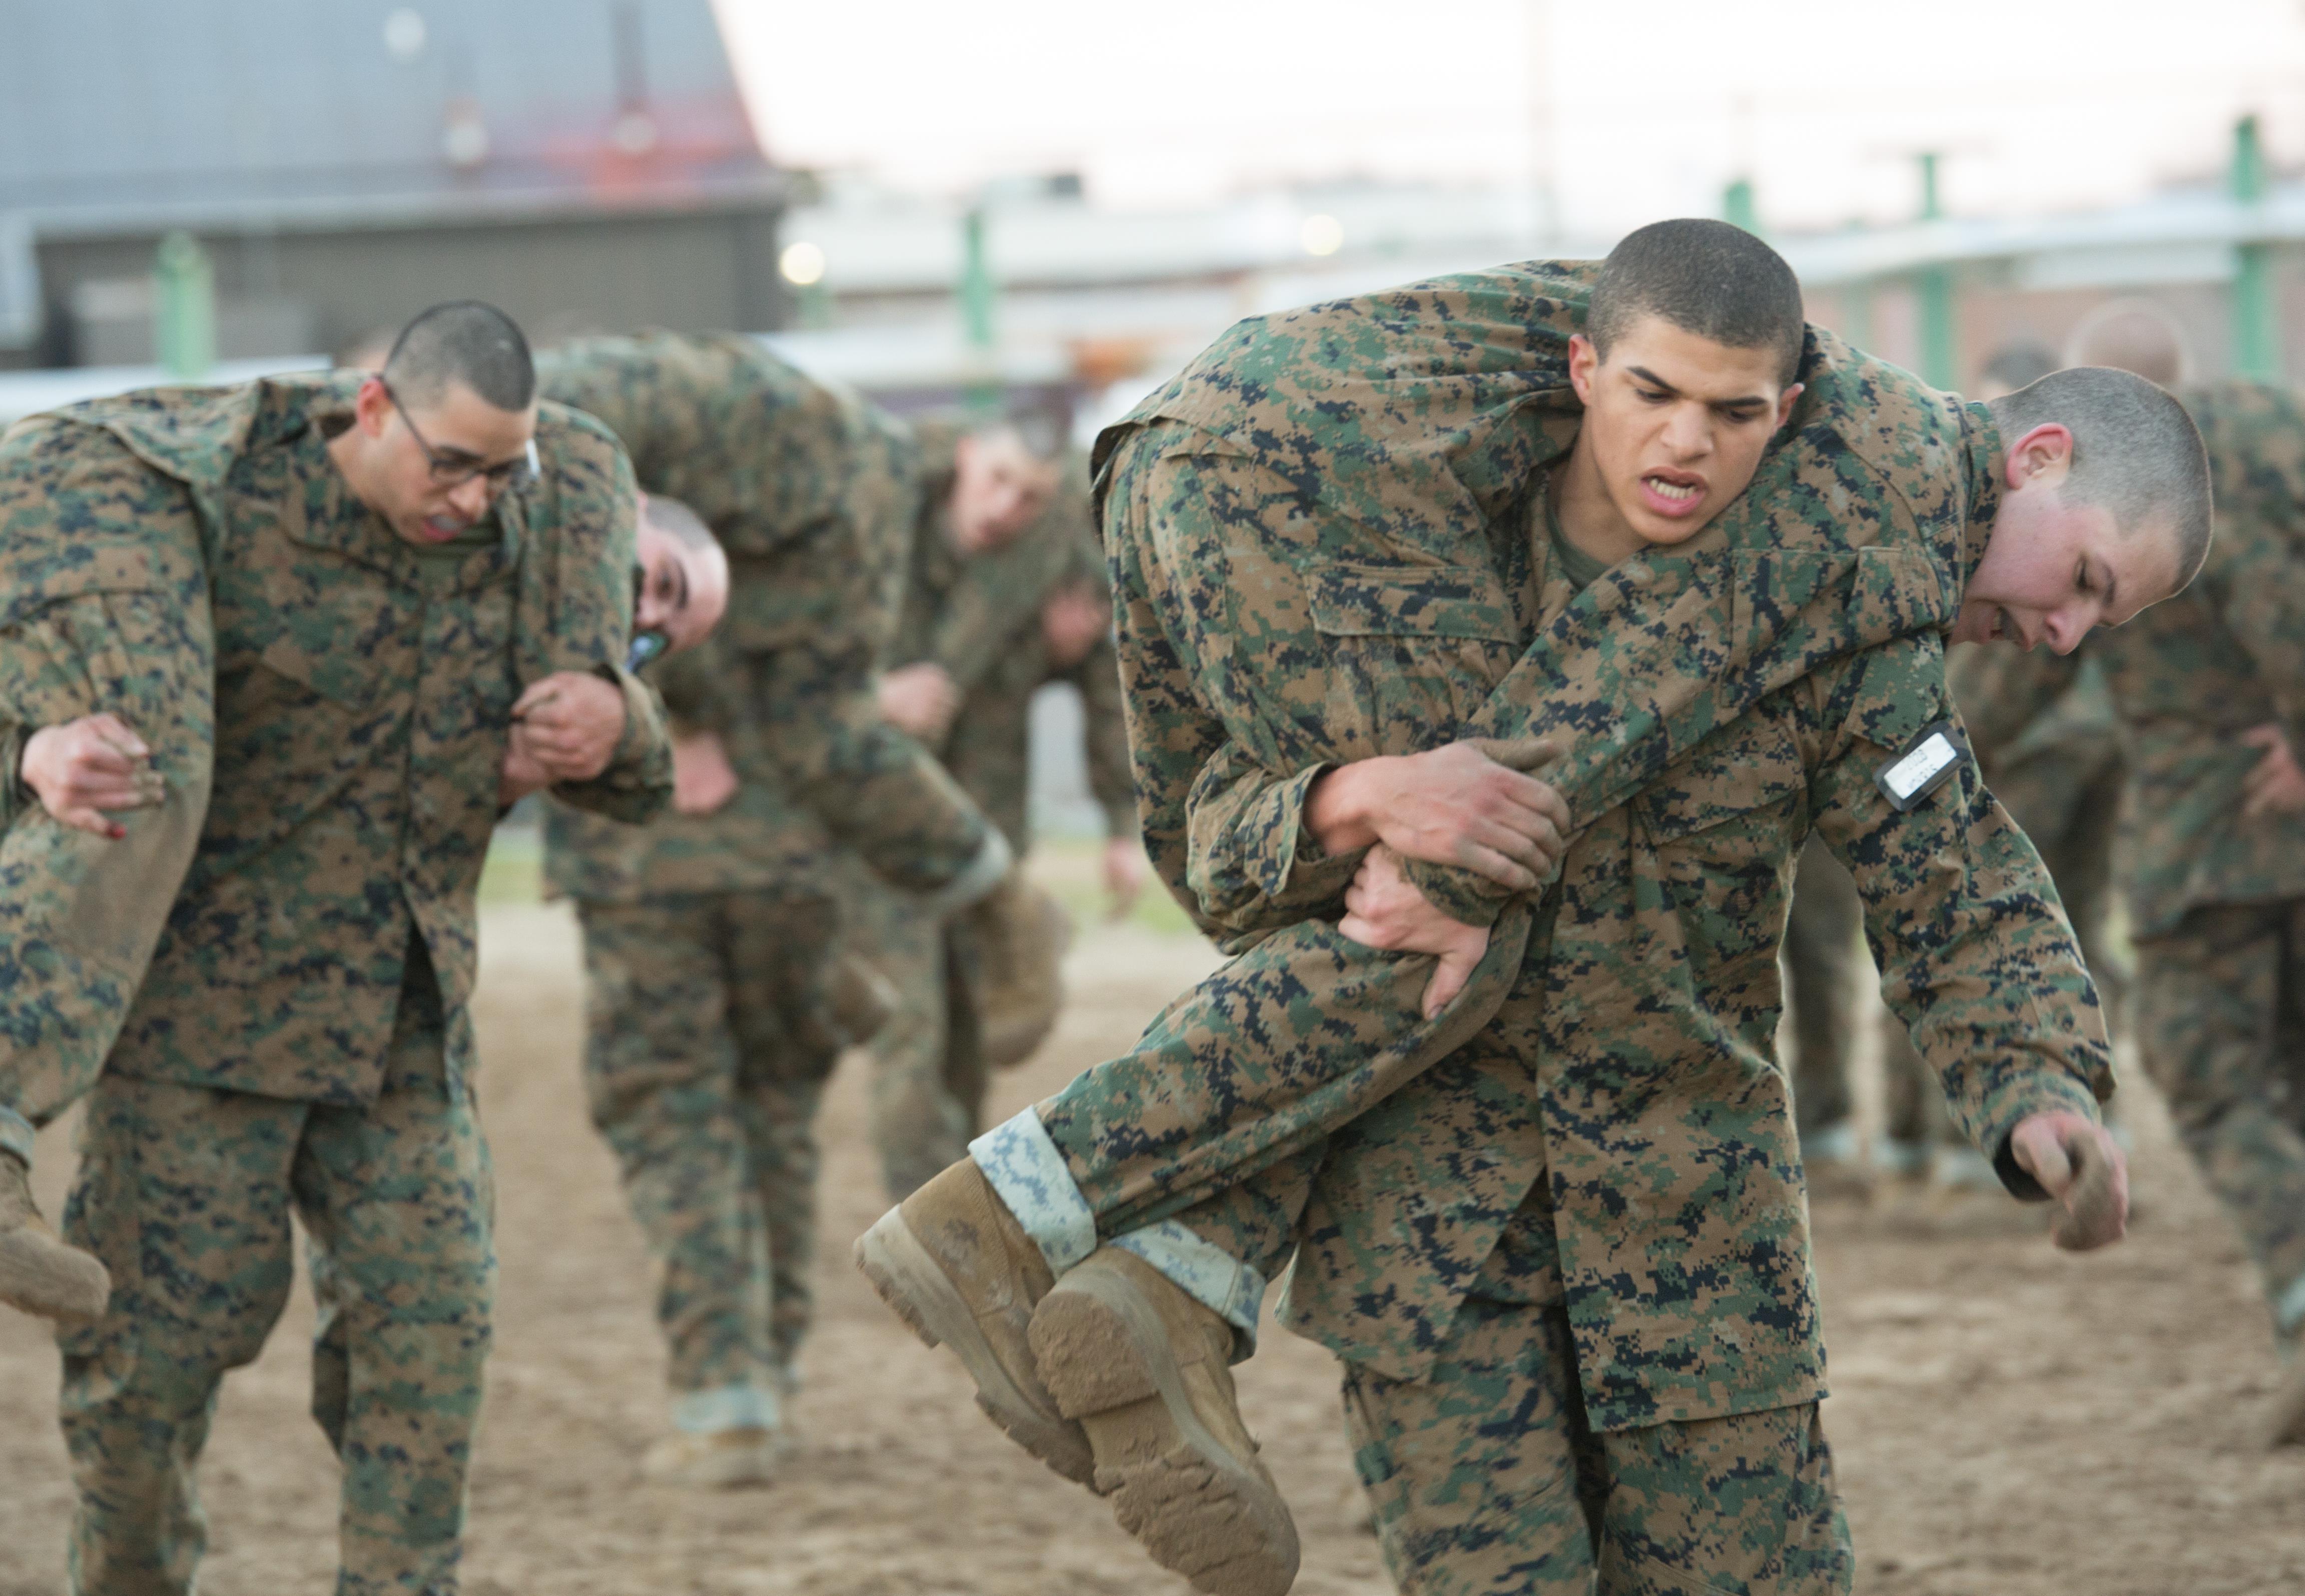 Marine Corps Recruit Depot